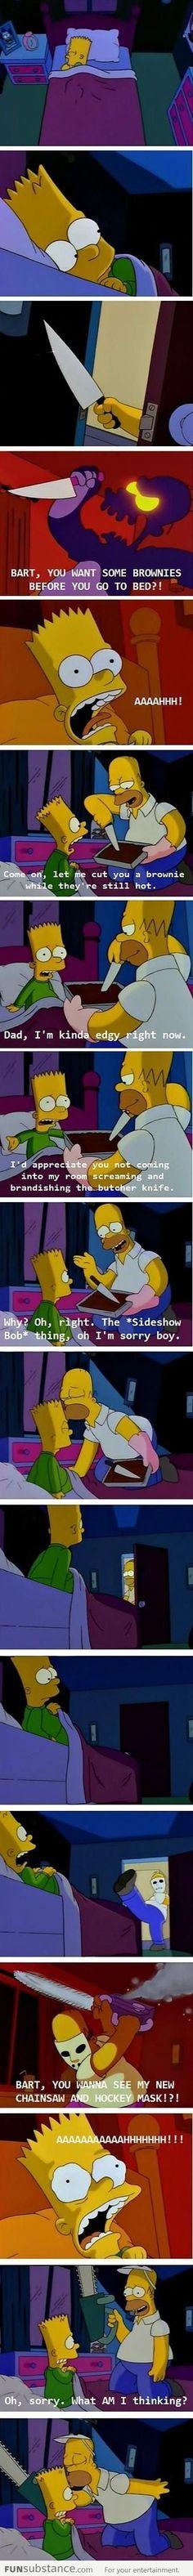 This made me laugh! > Homer Simpson - The Original Troll Dad